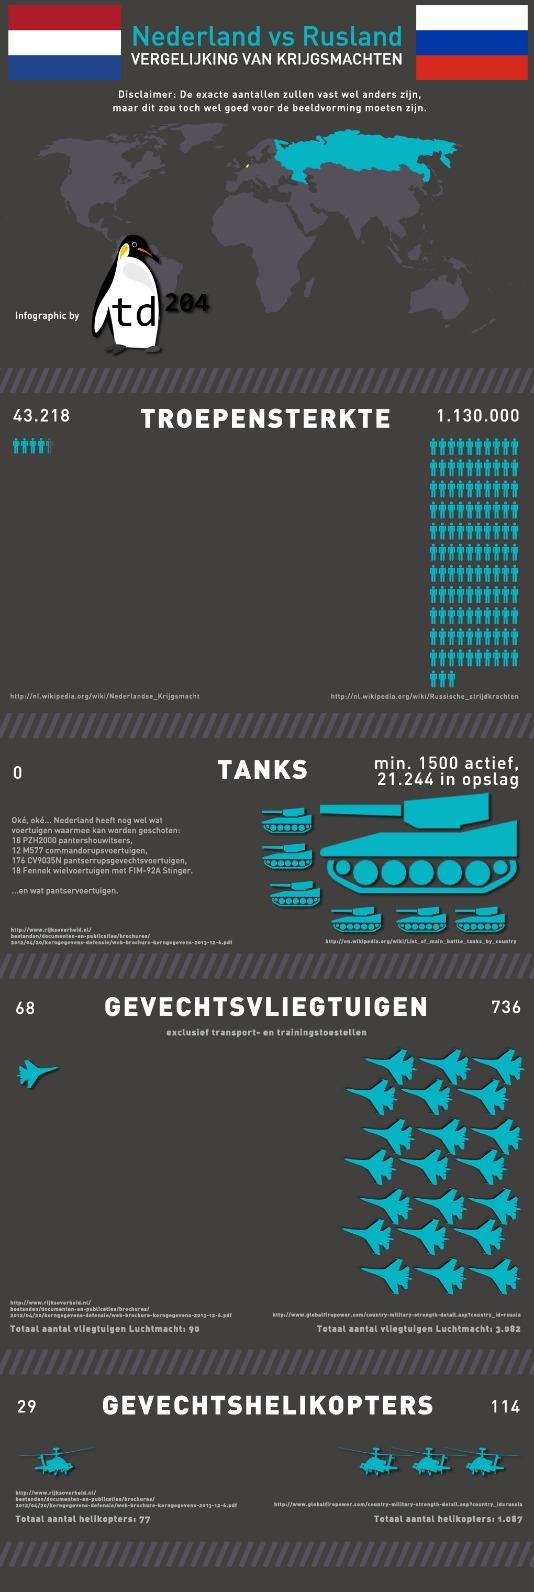 infographicnlversusrus.jpg